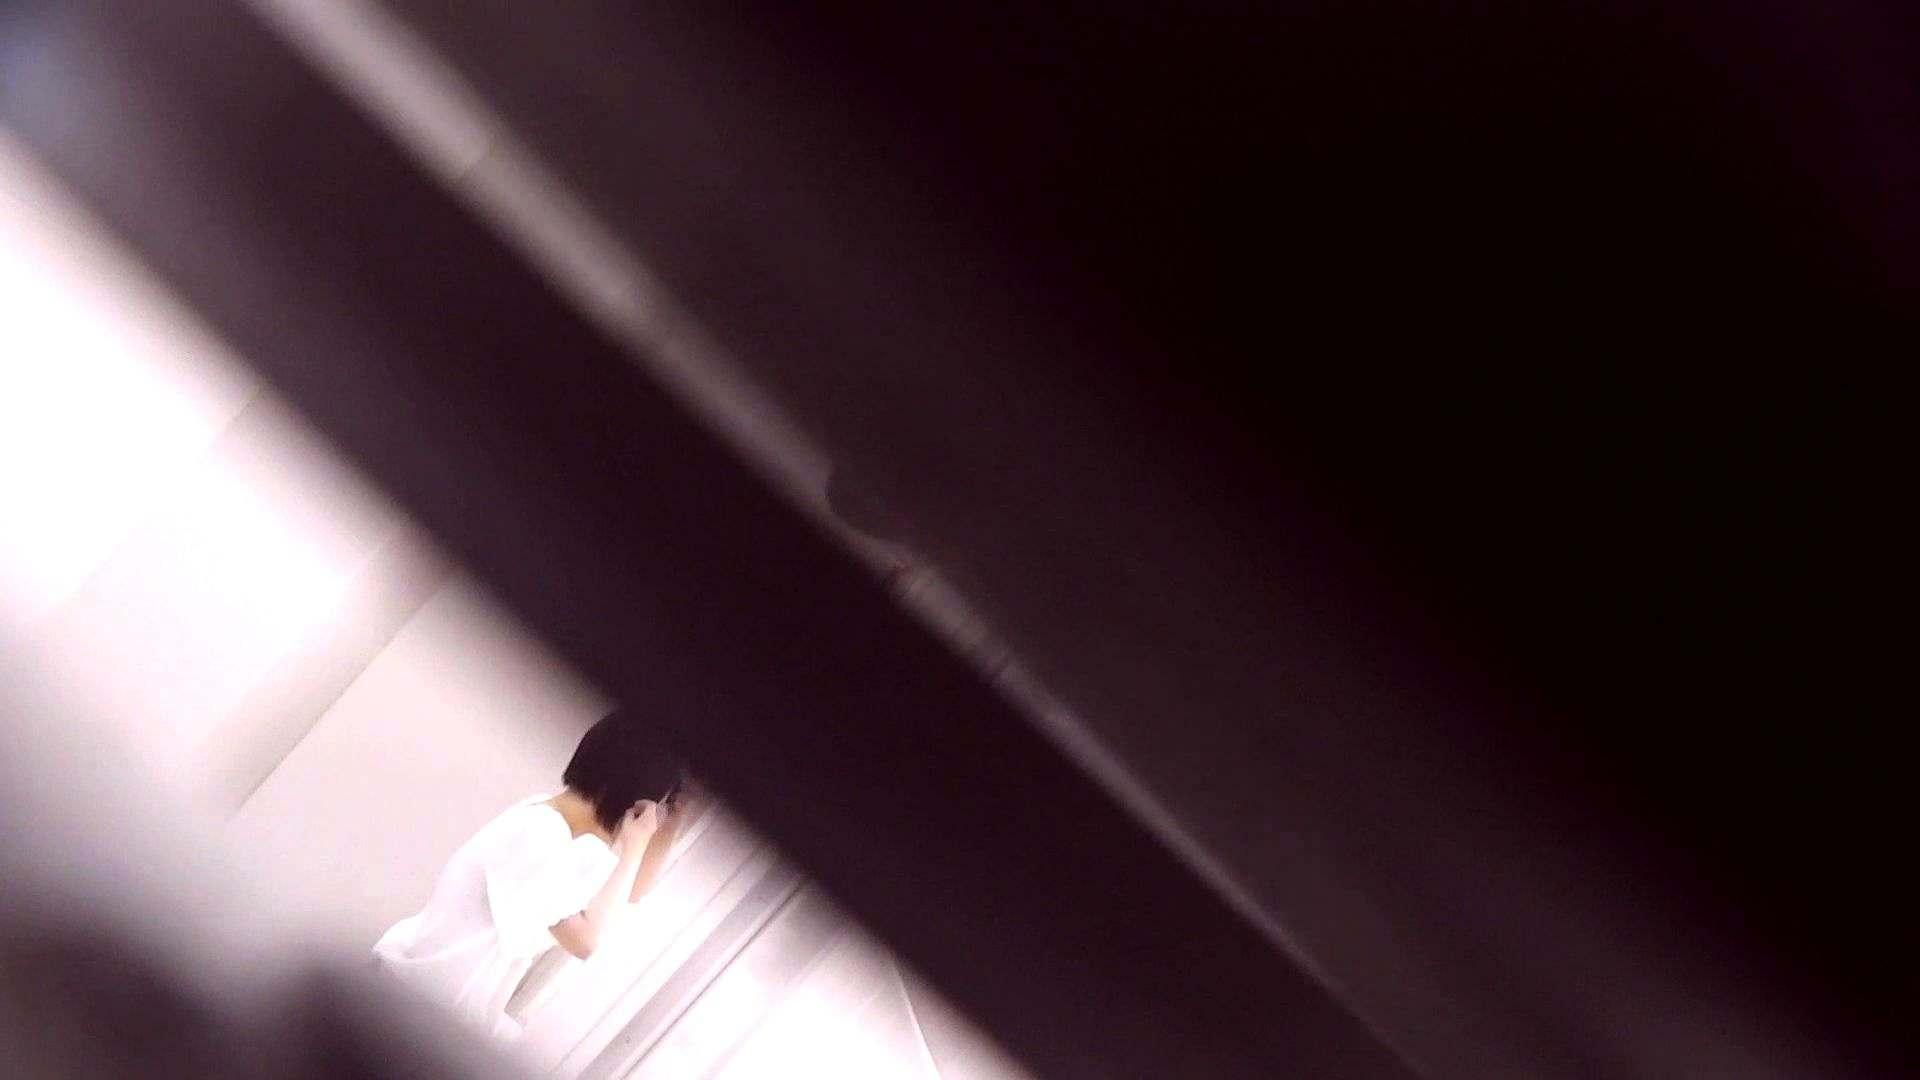 vol.17 命がけ潜伏洗面所! 張り裂けんばかりの大物 プライベート 盗撮ワレメ無修正動画無料 108画像 63